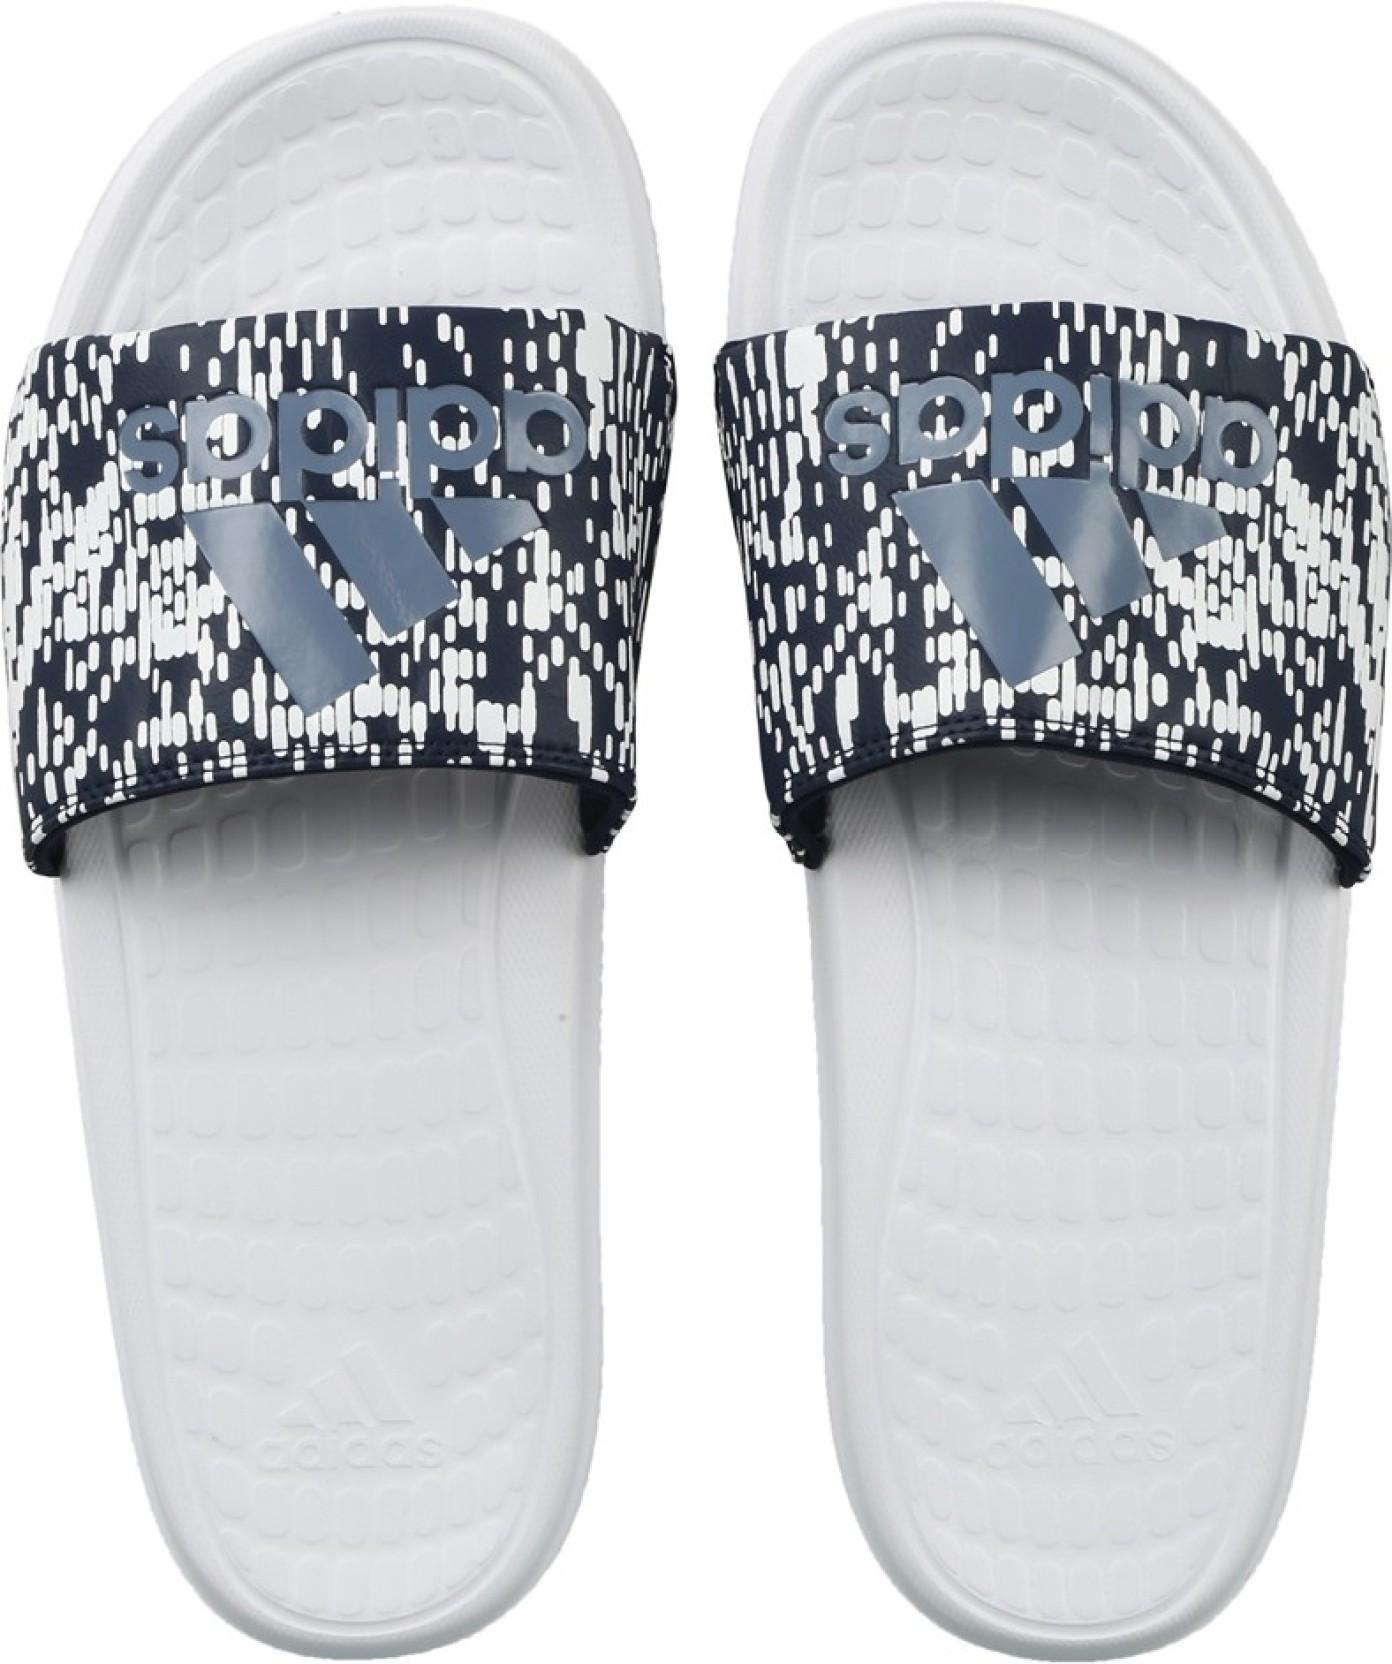 quality design ce81e 5b3ca ADIDAS VOLOOMIX GR Slides. Home · Footwear · Men s Footwear